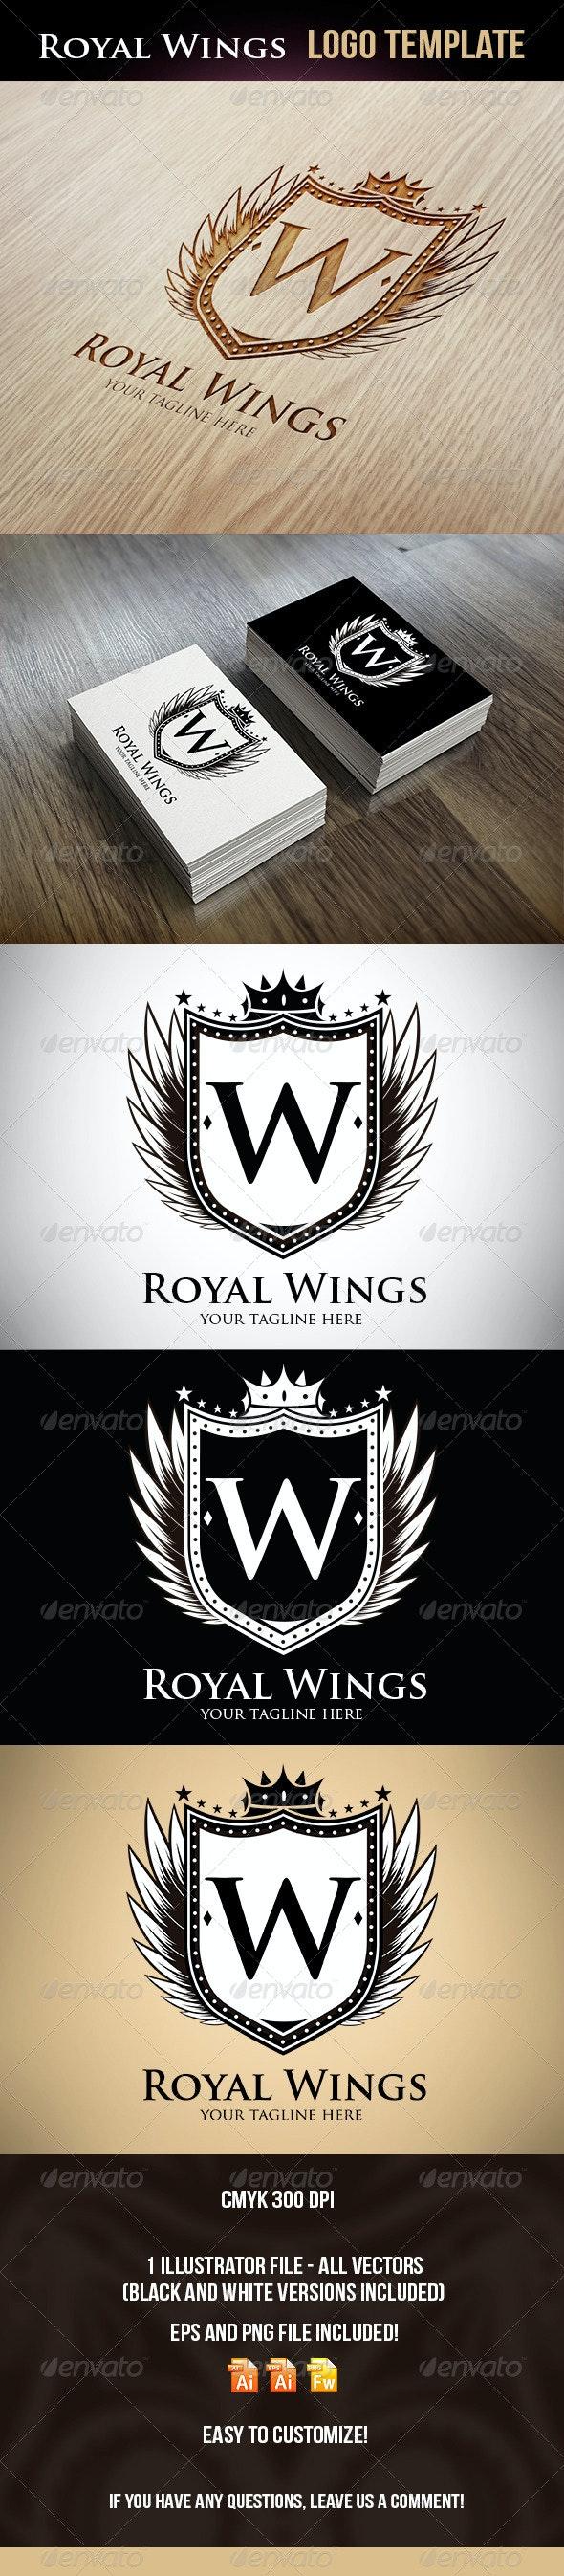 Royal Wings Logo Template - Logo Templates